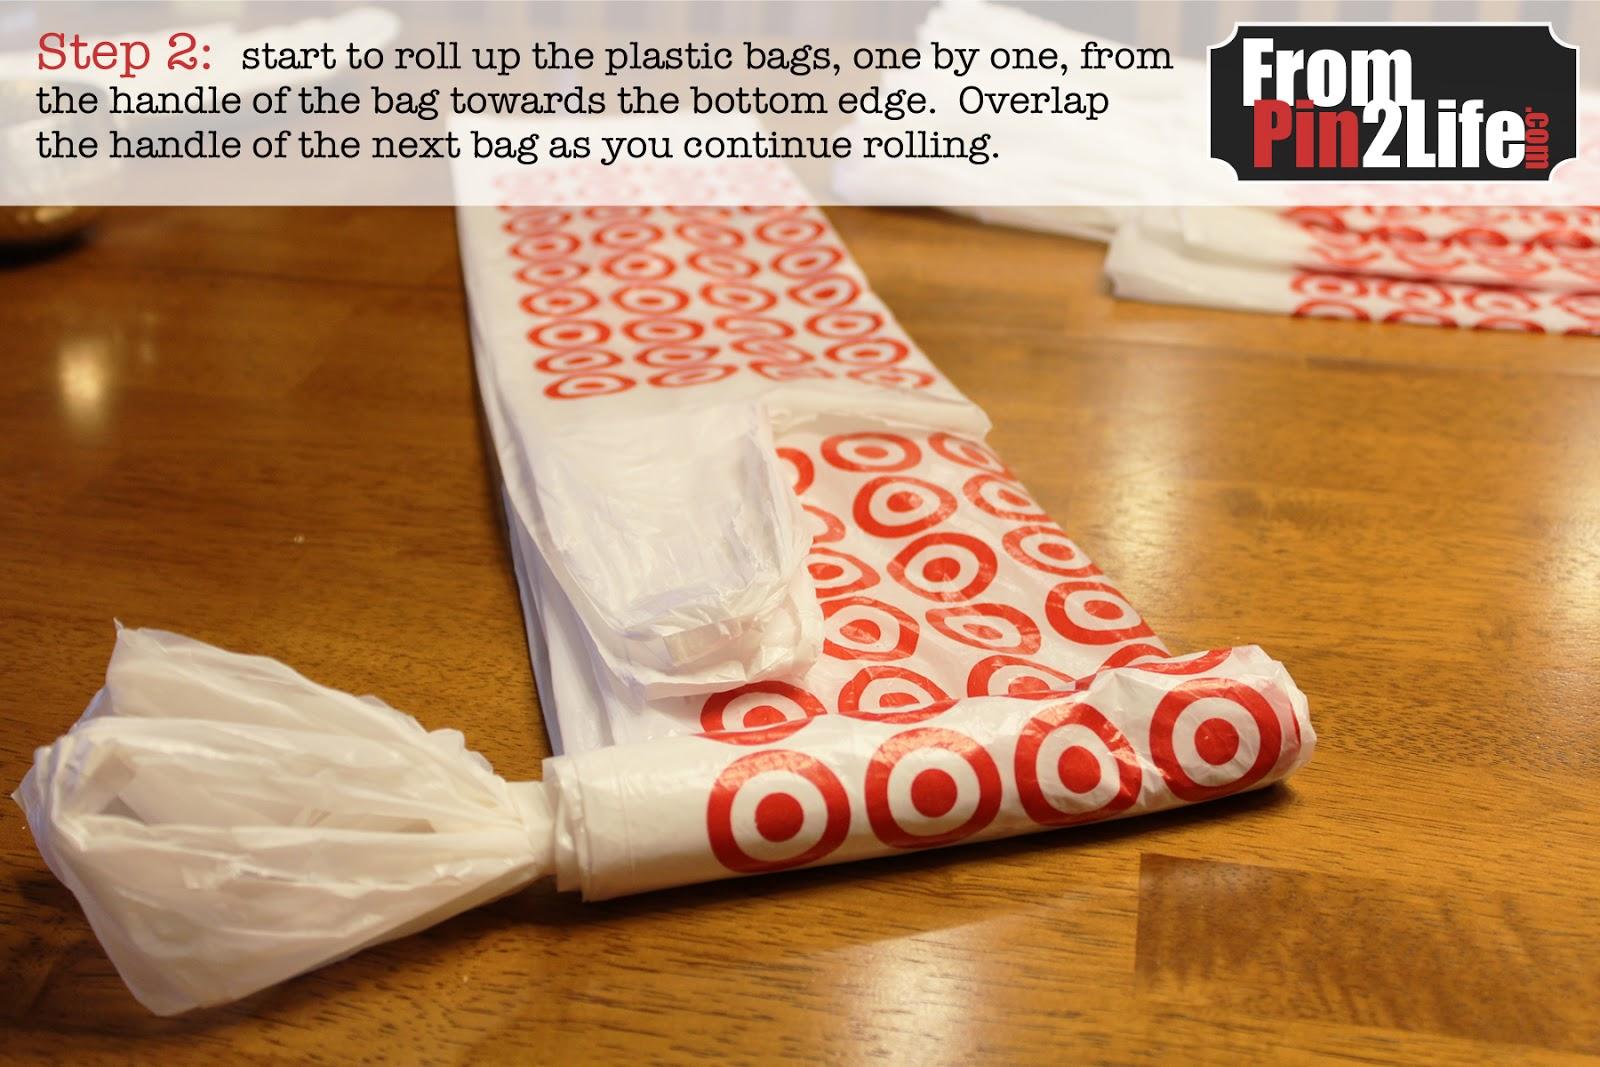 2011-11-02 plastic bag organizer 03 · via · e6b26814bed0387f5051b648a1c8d638 26a59928505f1fb80d956faf5e2b16e2 & Plastic Bag Storage Options and Tips u2013 Do It And How